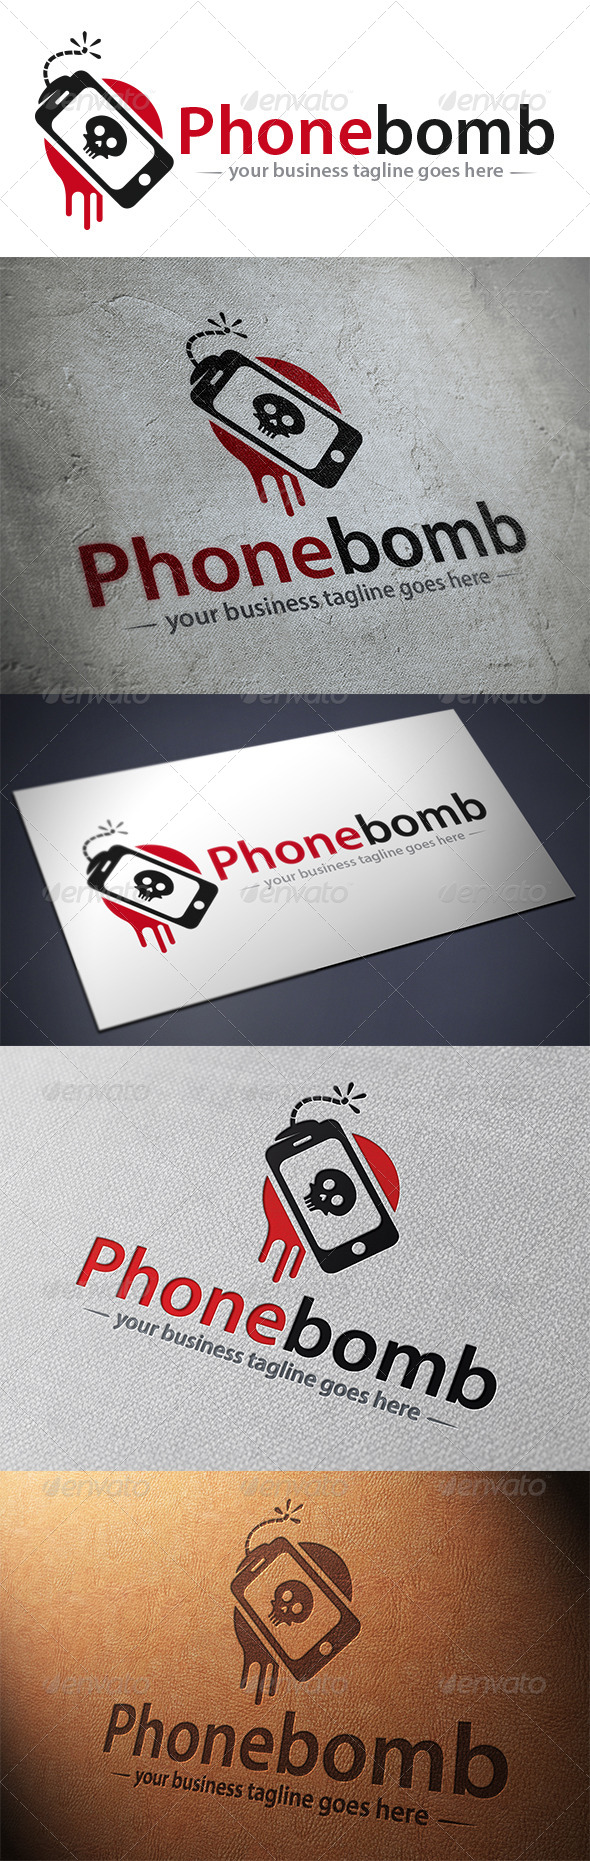 GraphicRiver Phone Bomb Logo 5475807